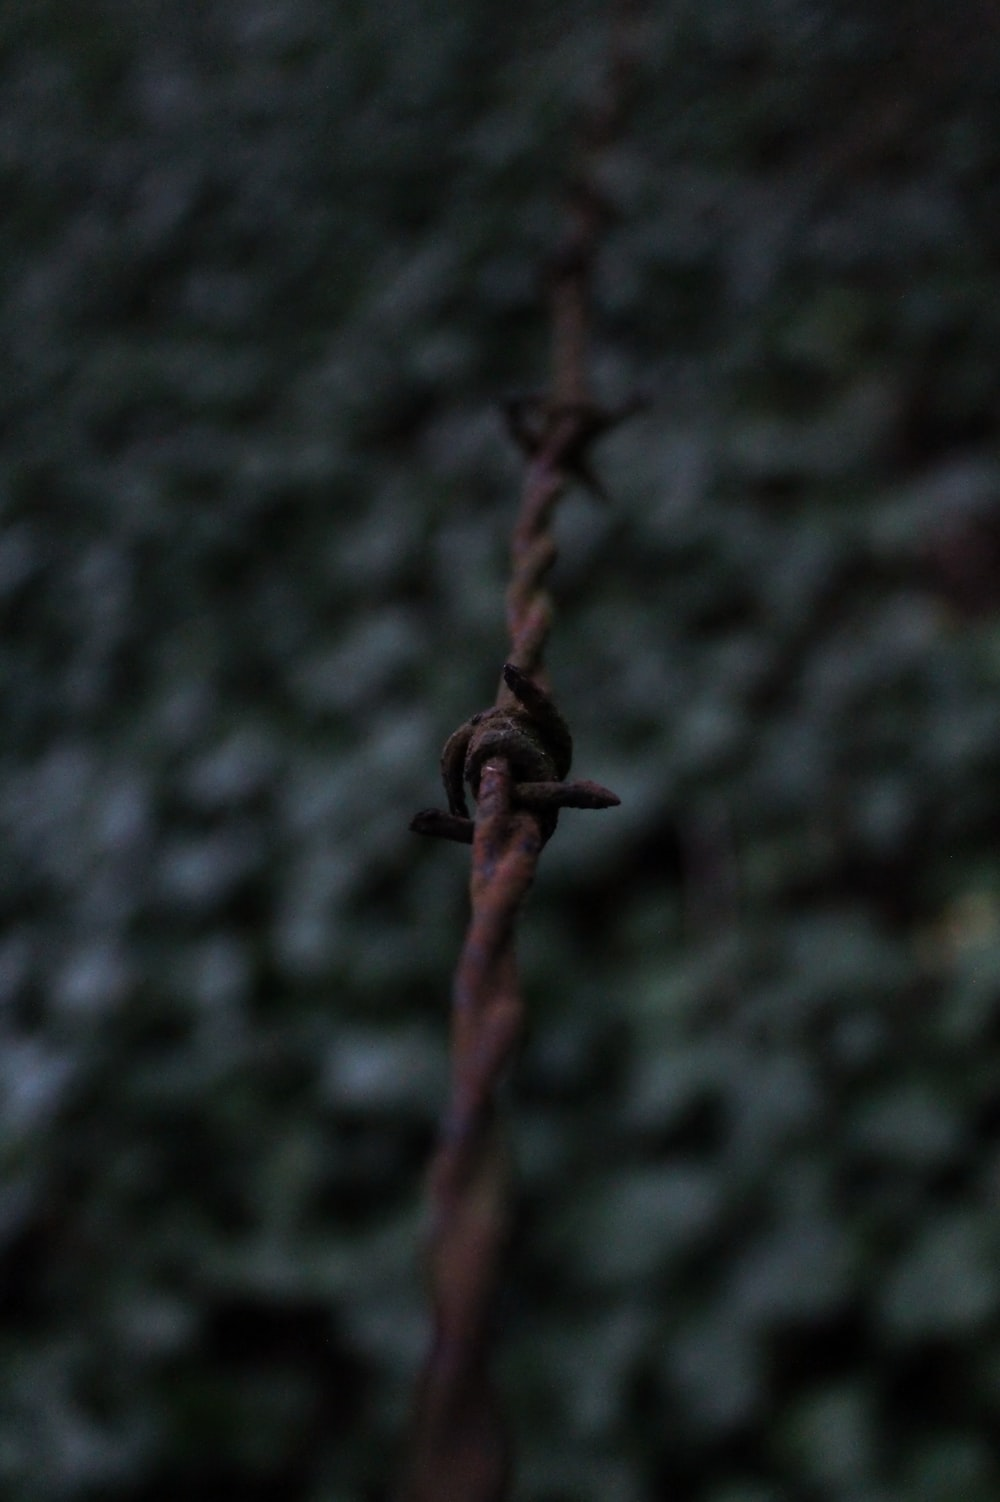 rusty barb wire